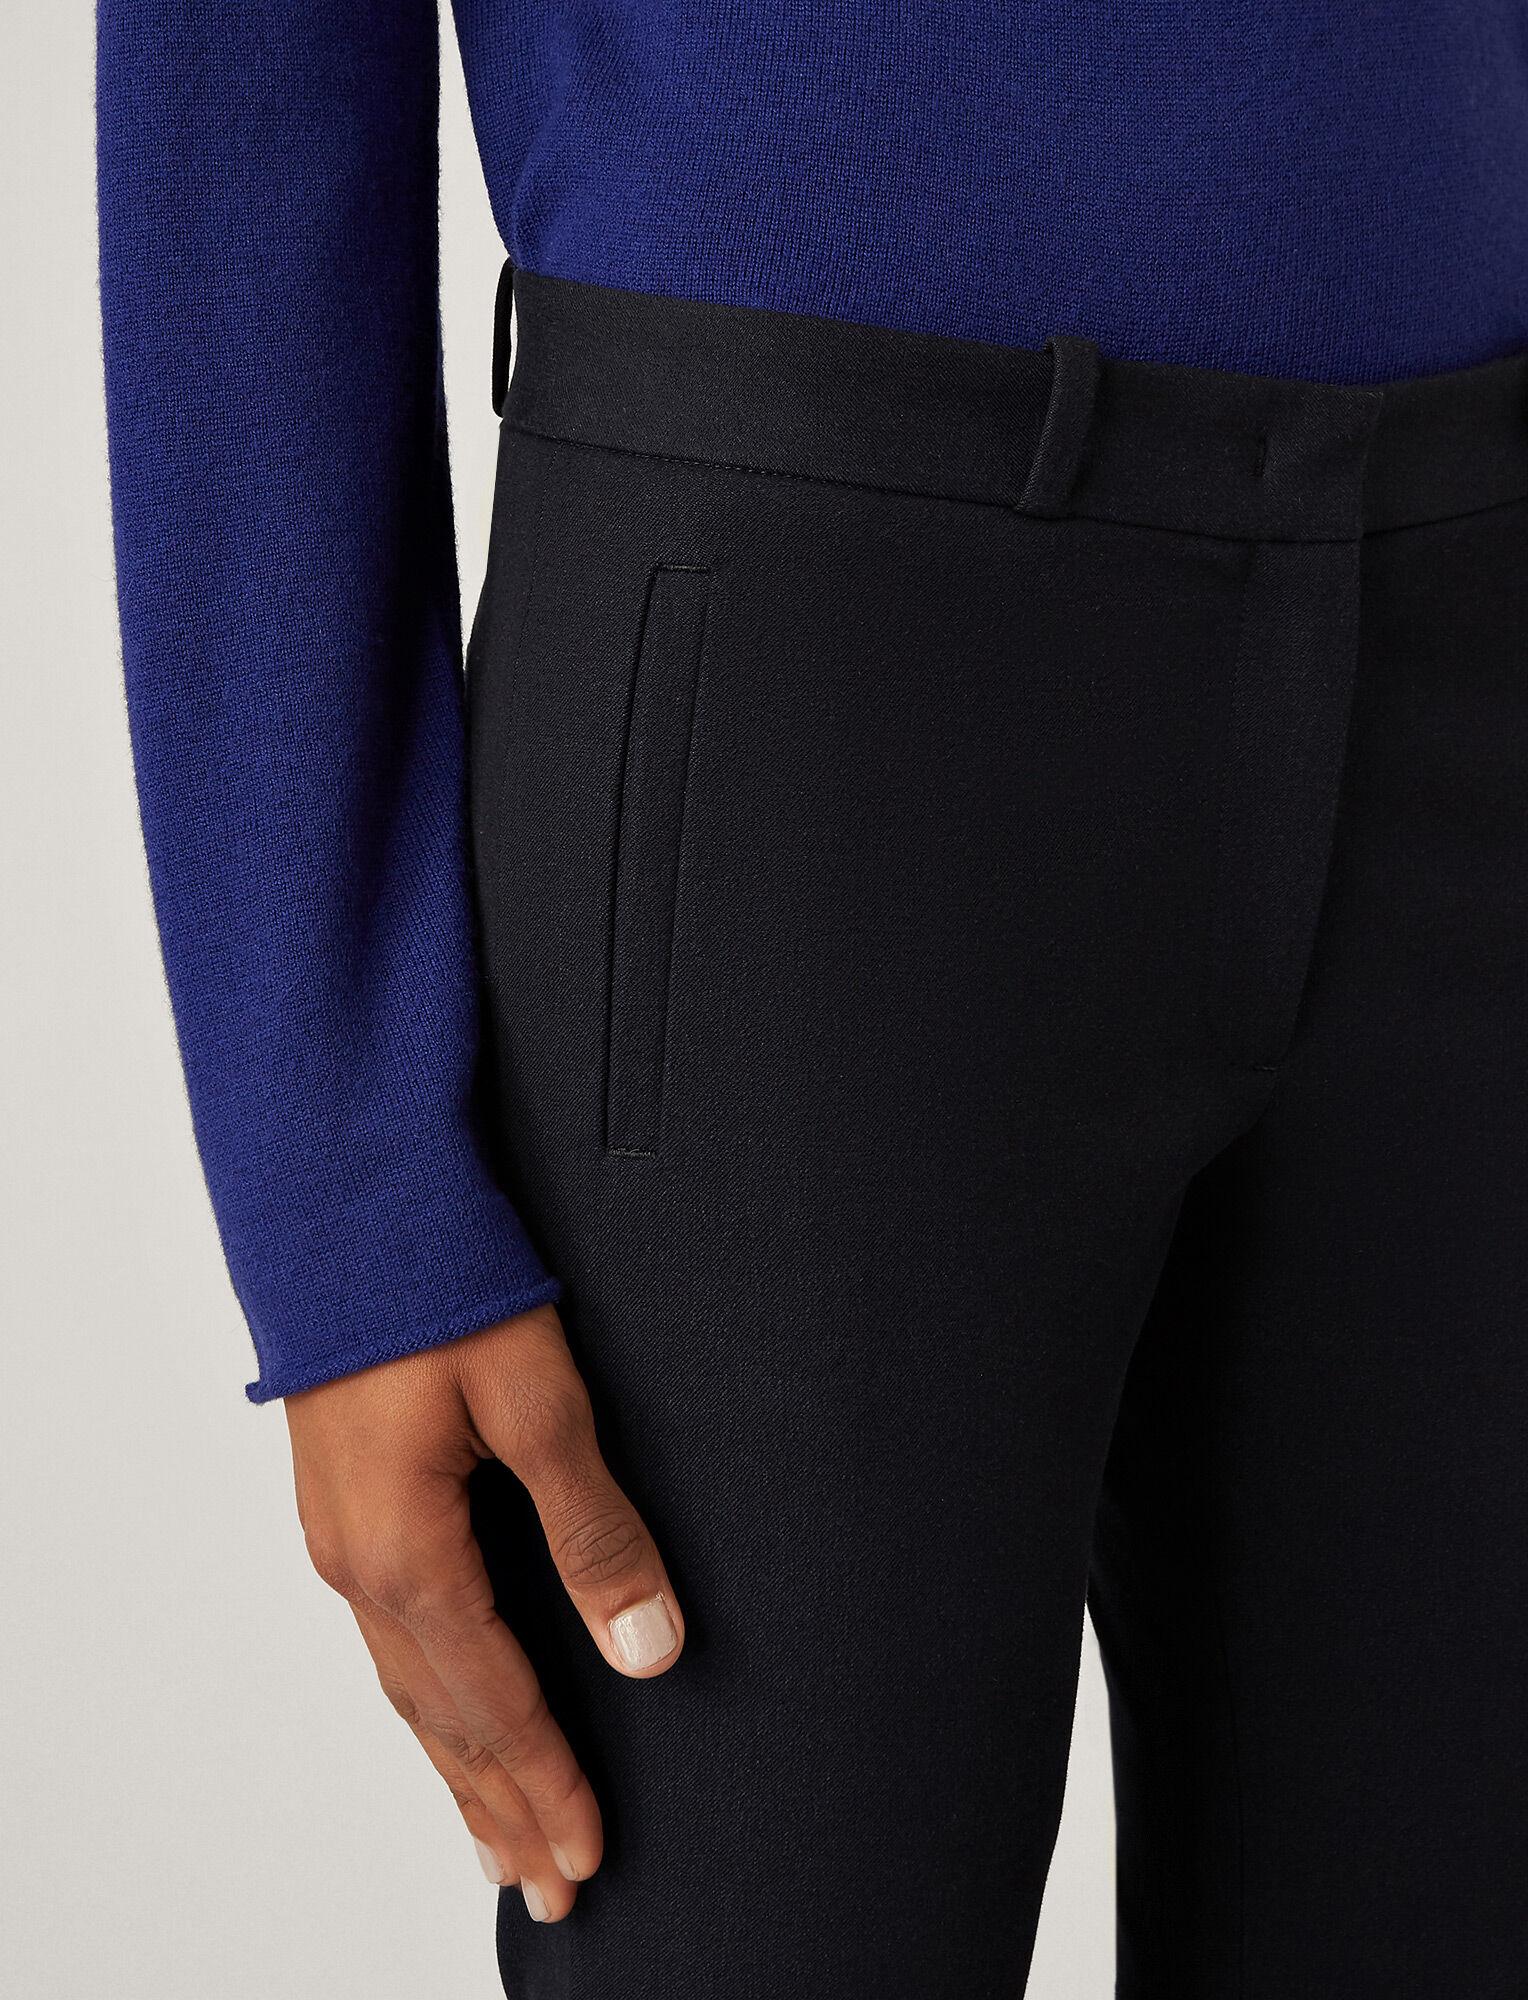 Joseph, New Eliston Gabardine Stretch Trousers, in NAVY